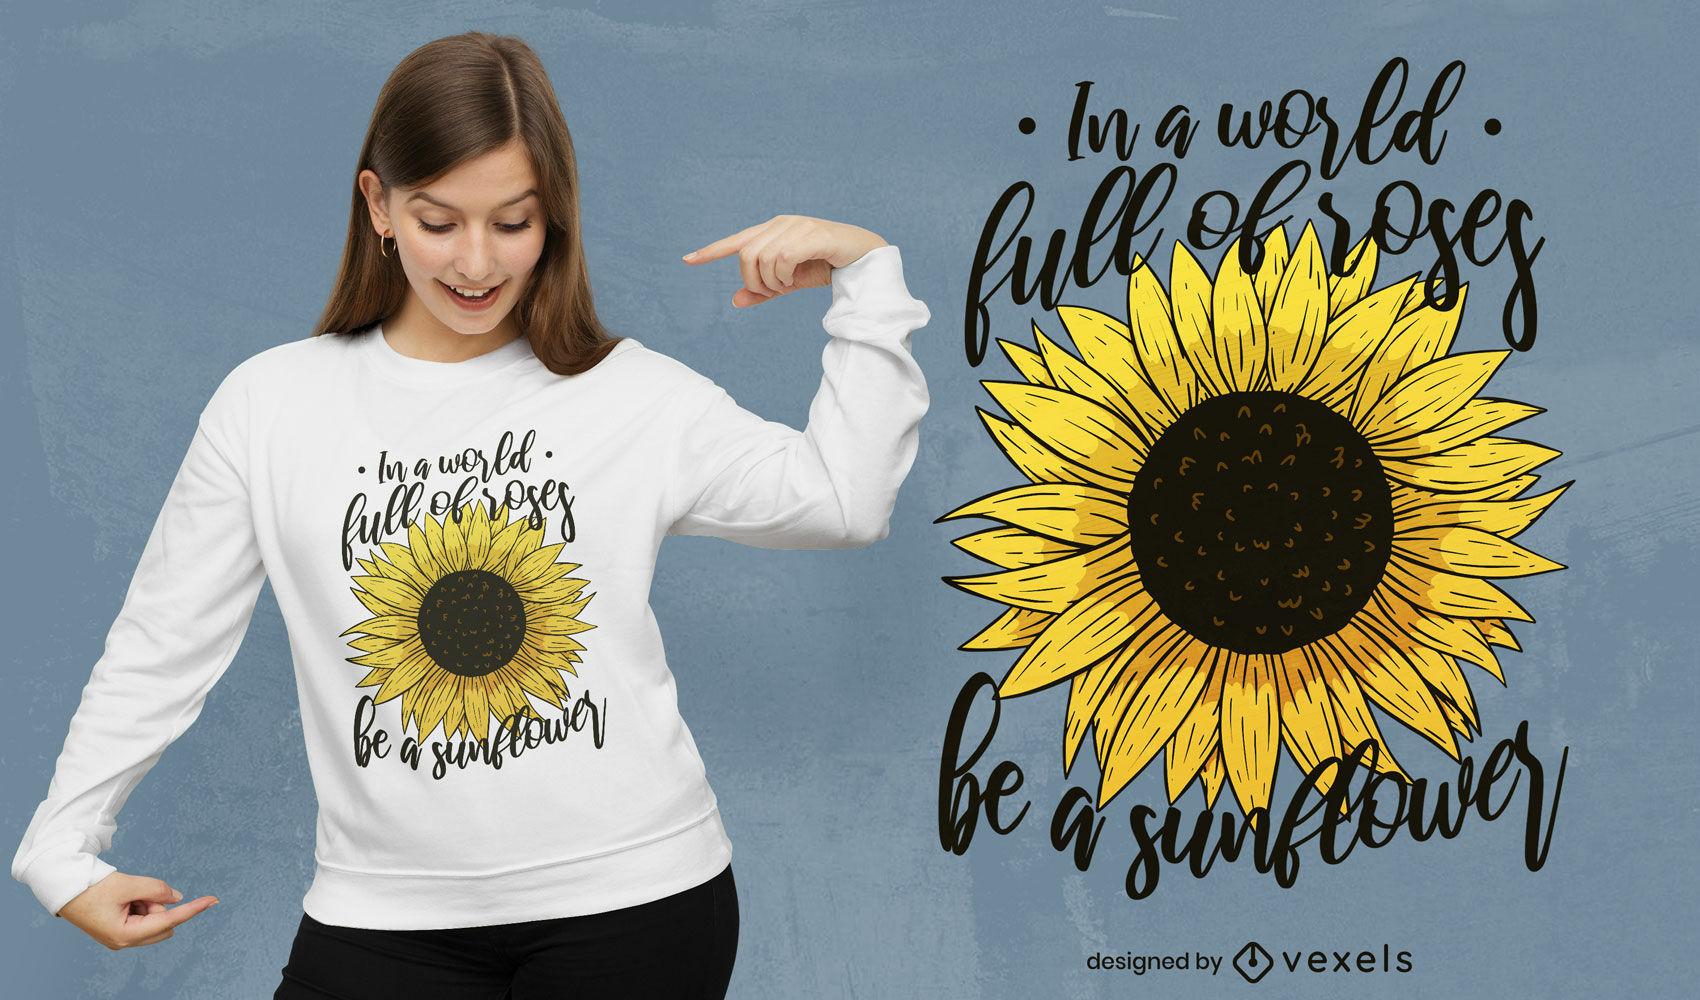 Sunflower rose quote t-shirt design